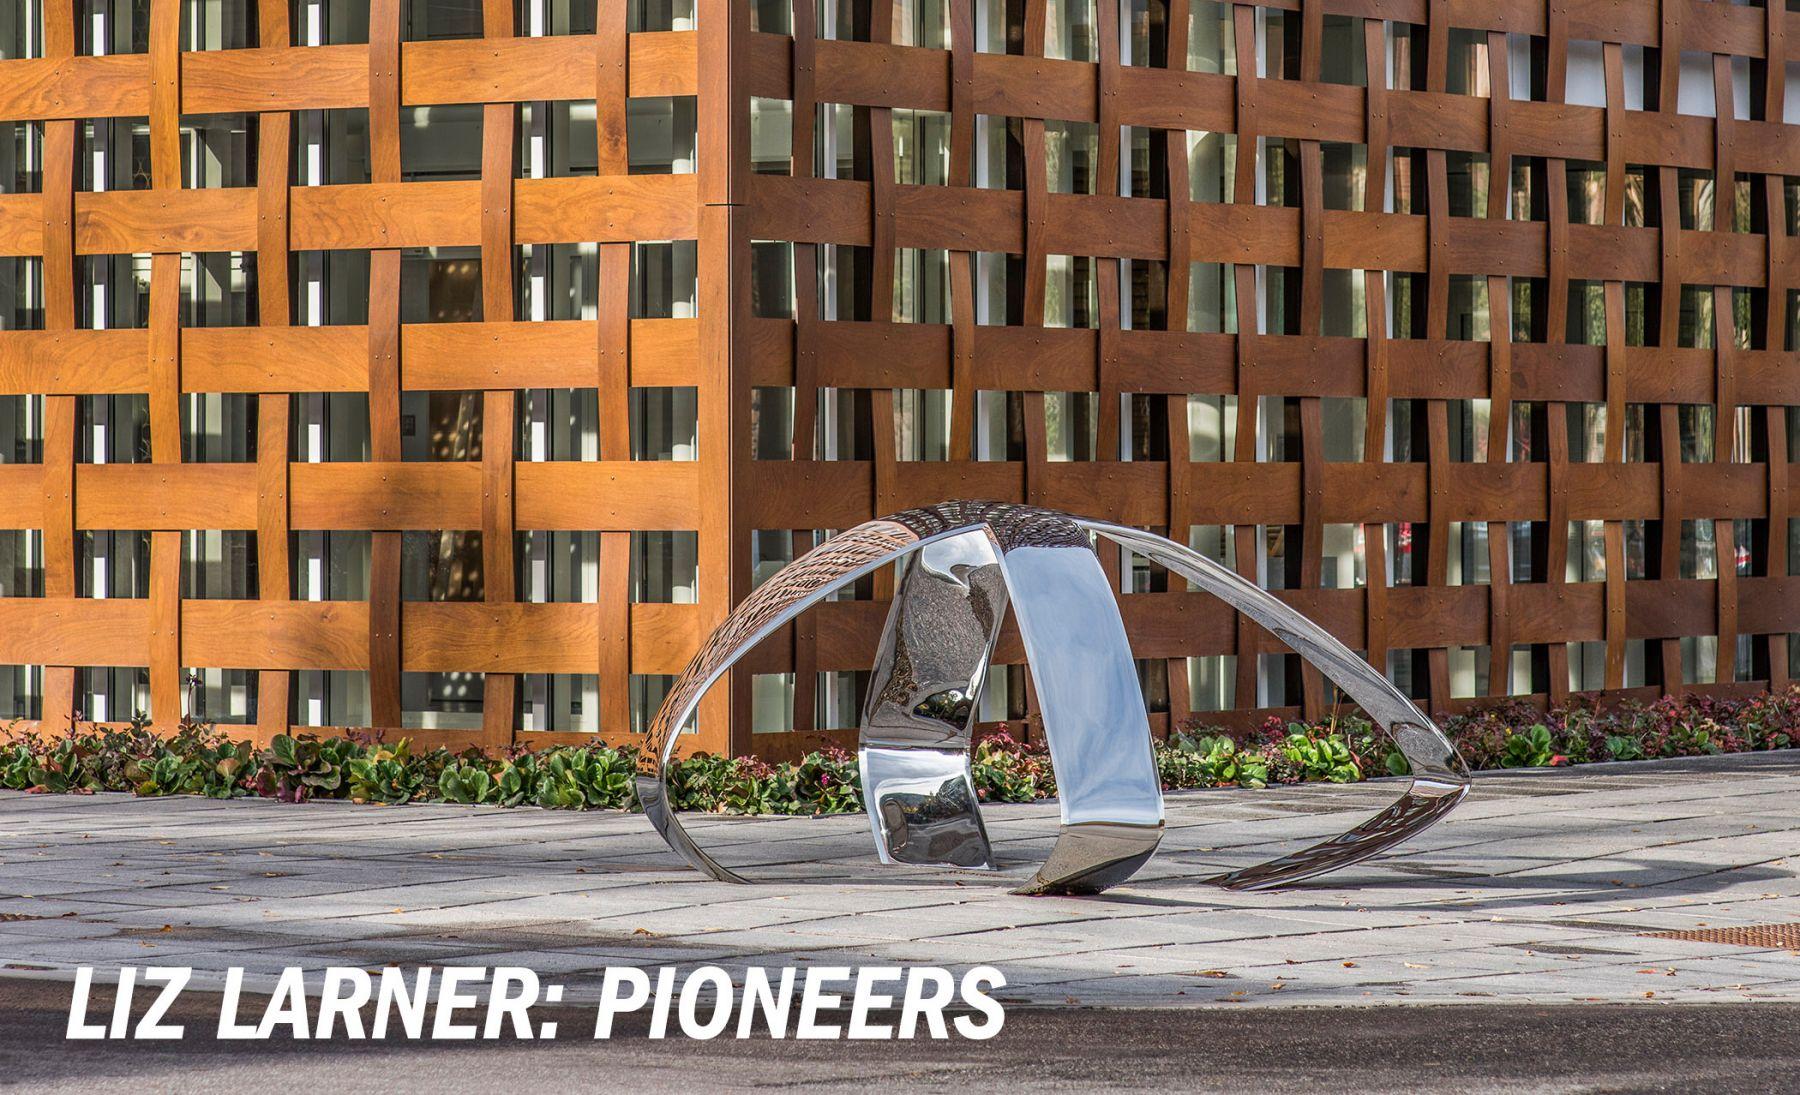 Liz Larner: Pioneers